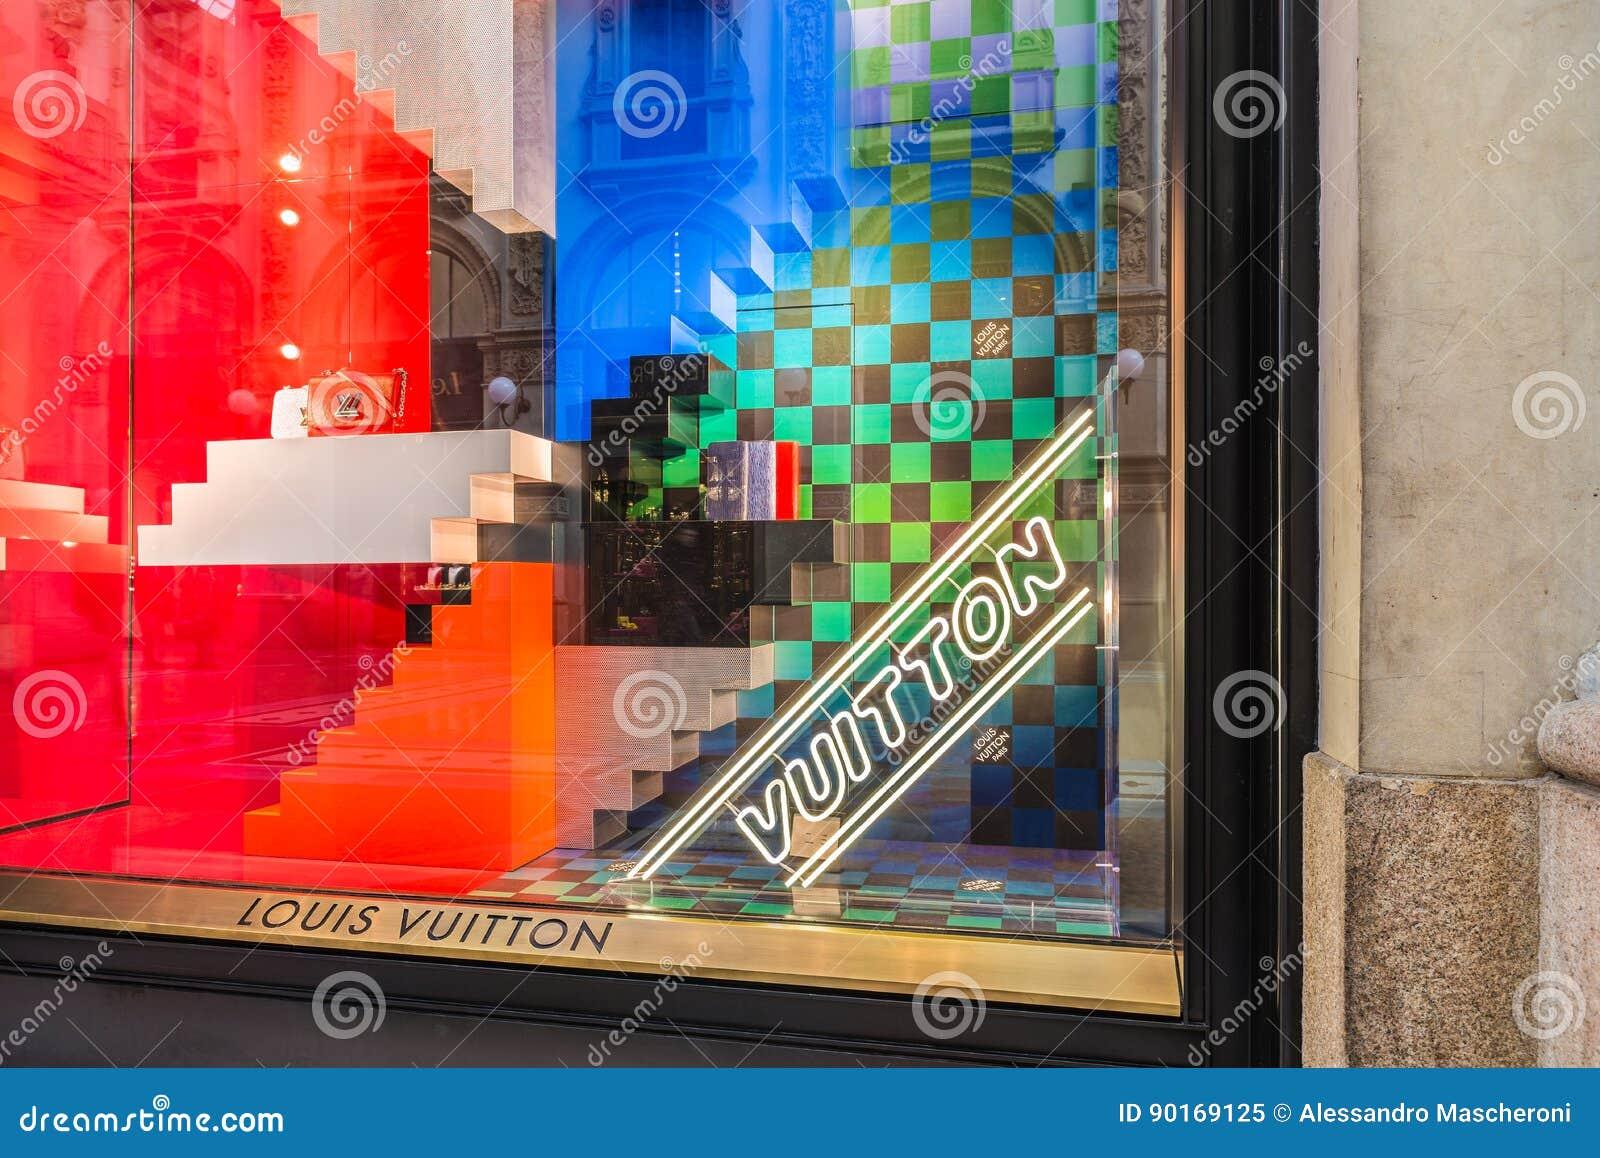 Louis Vuitton Fashion Boutique In Italy Editorial Photo ...